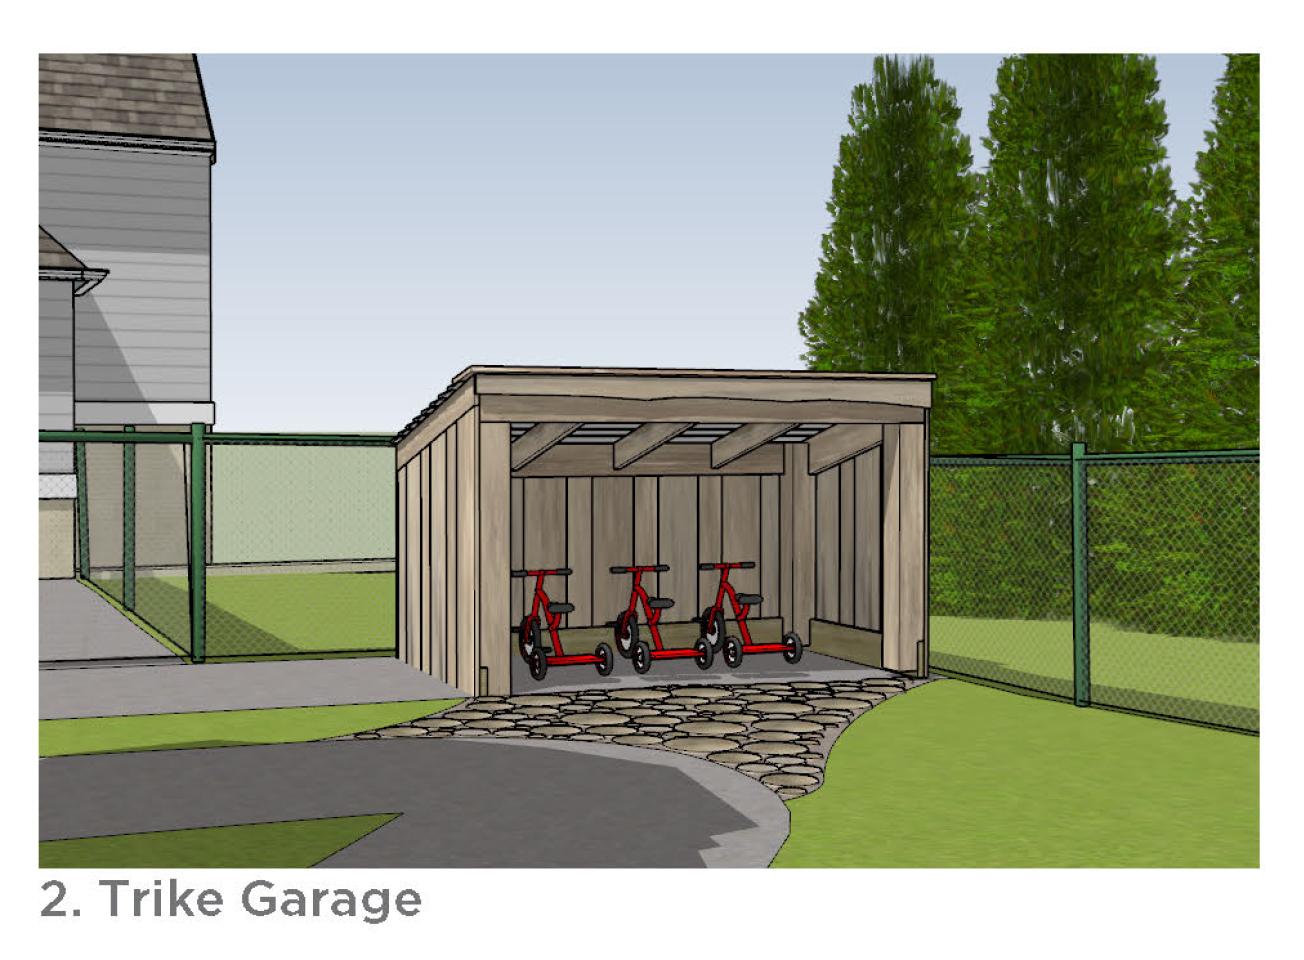 Photo of the trike garage.